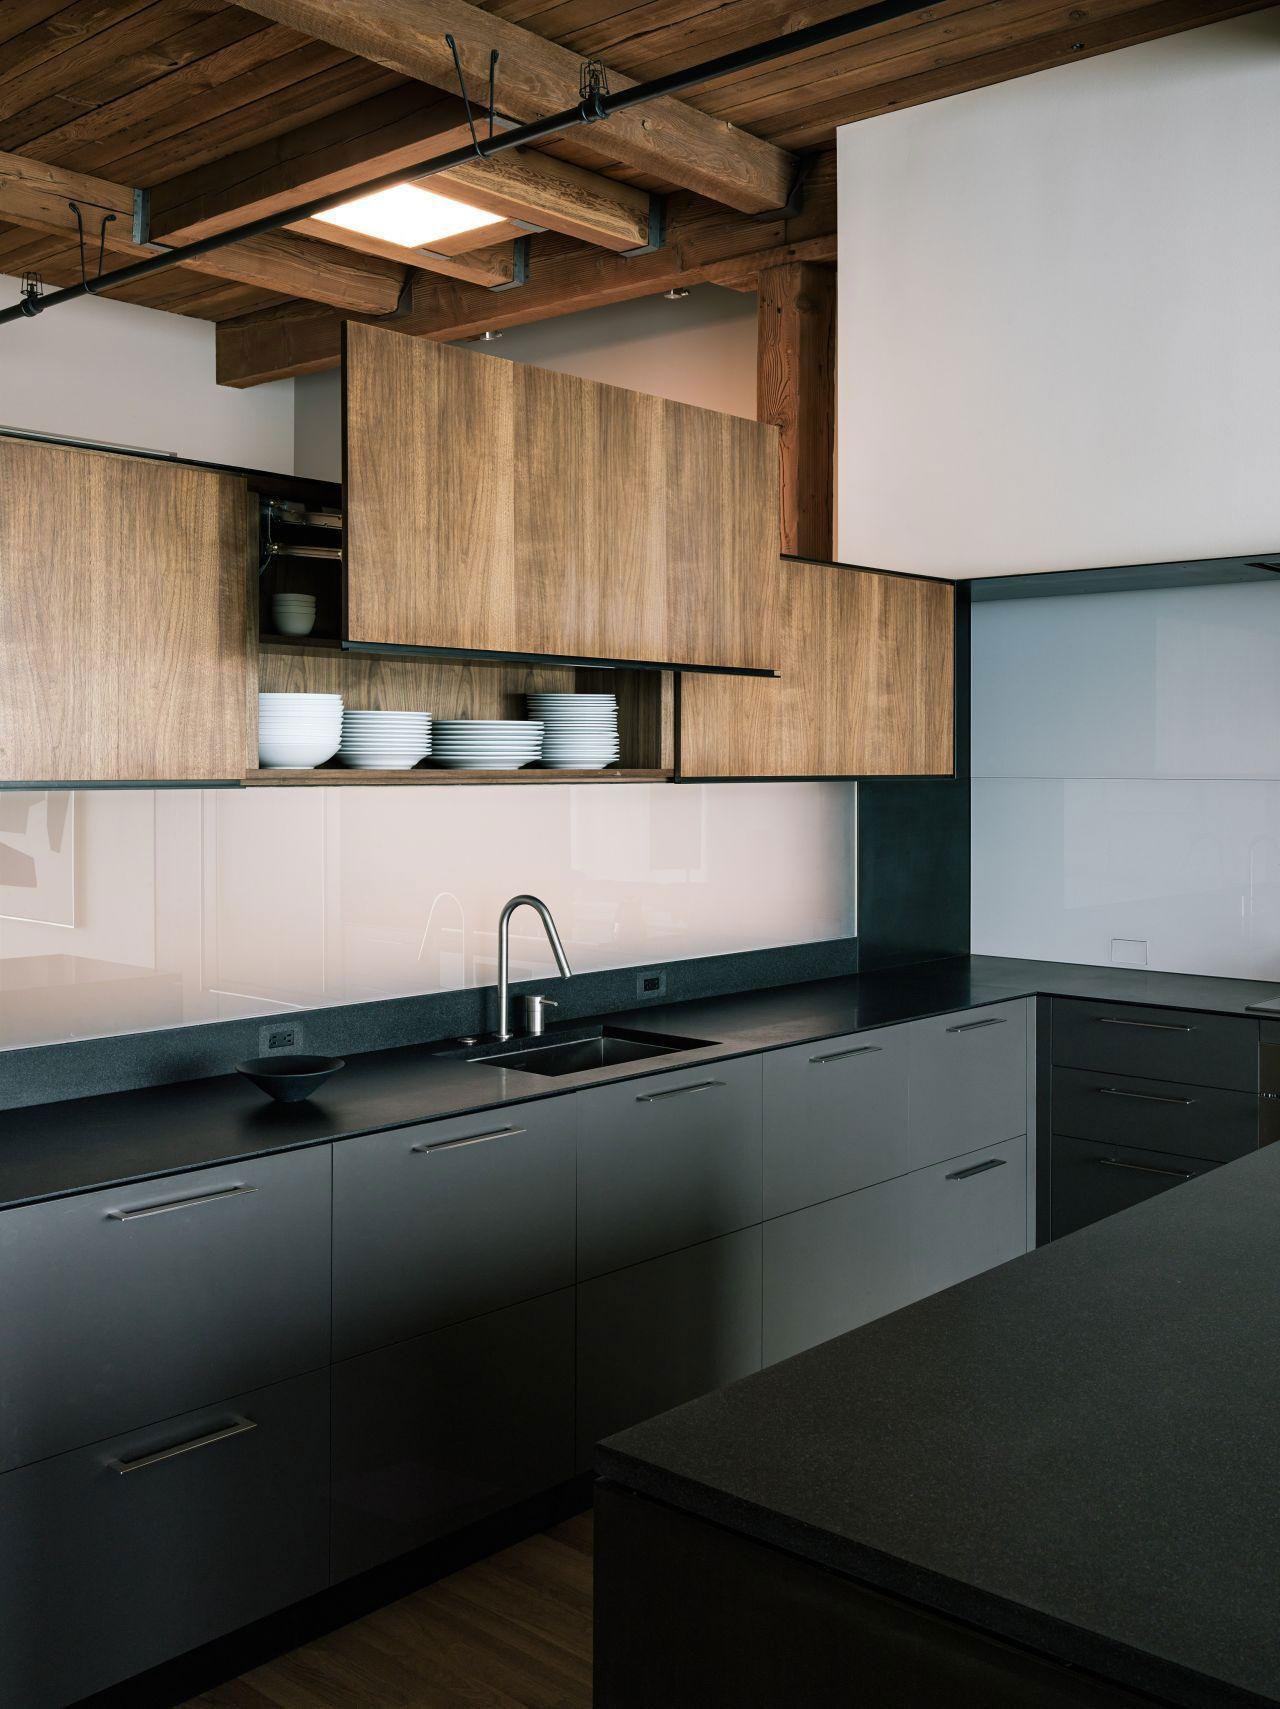 loft kitchen design ideas. classy inspiration loft kitchen design